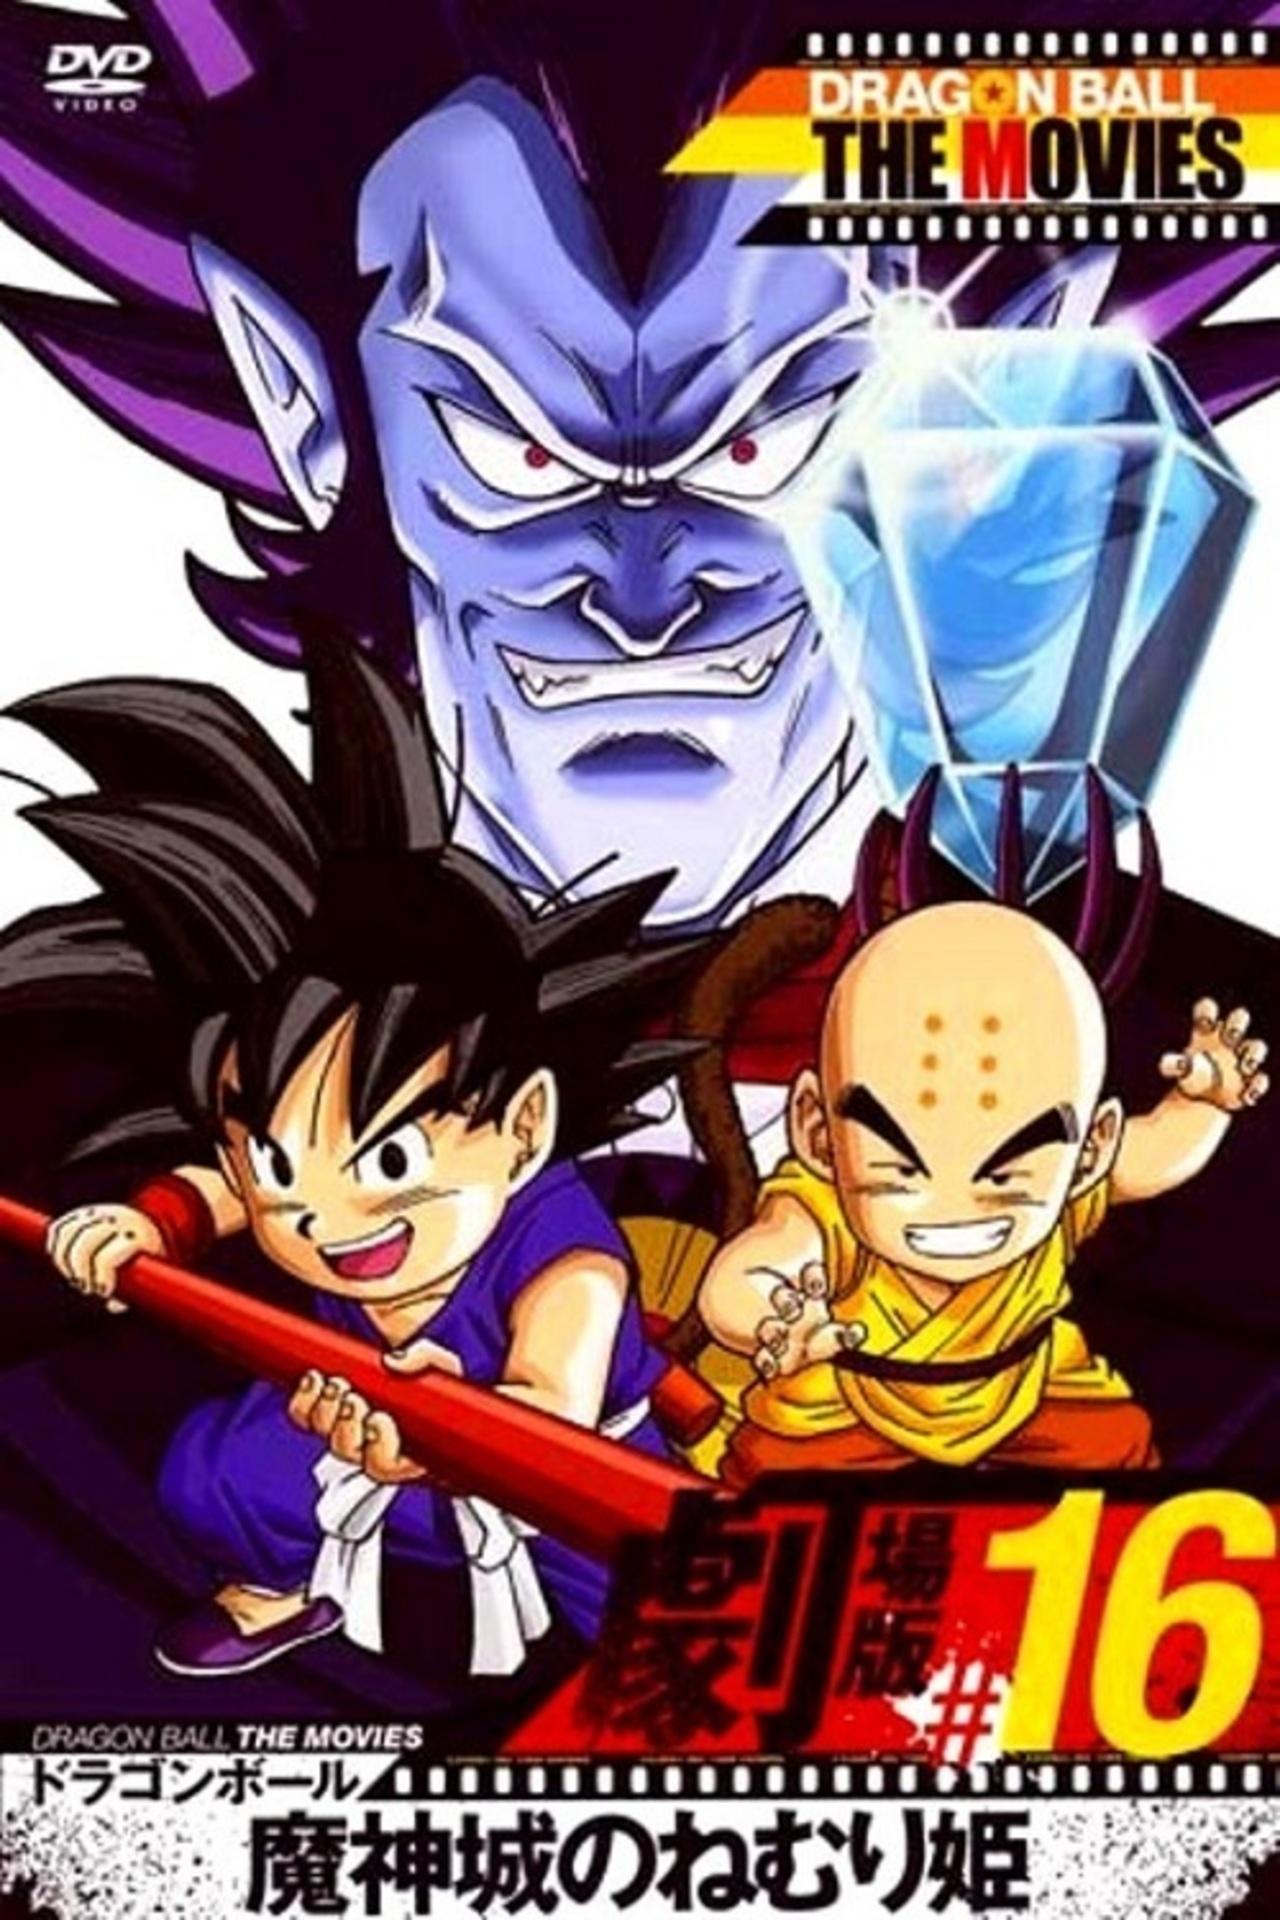 Dragon Ball: Doragon bôru - Majin jô no nemuri hime kapak